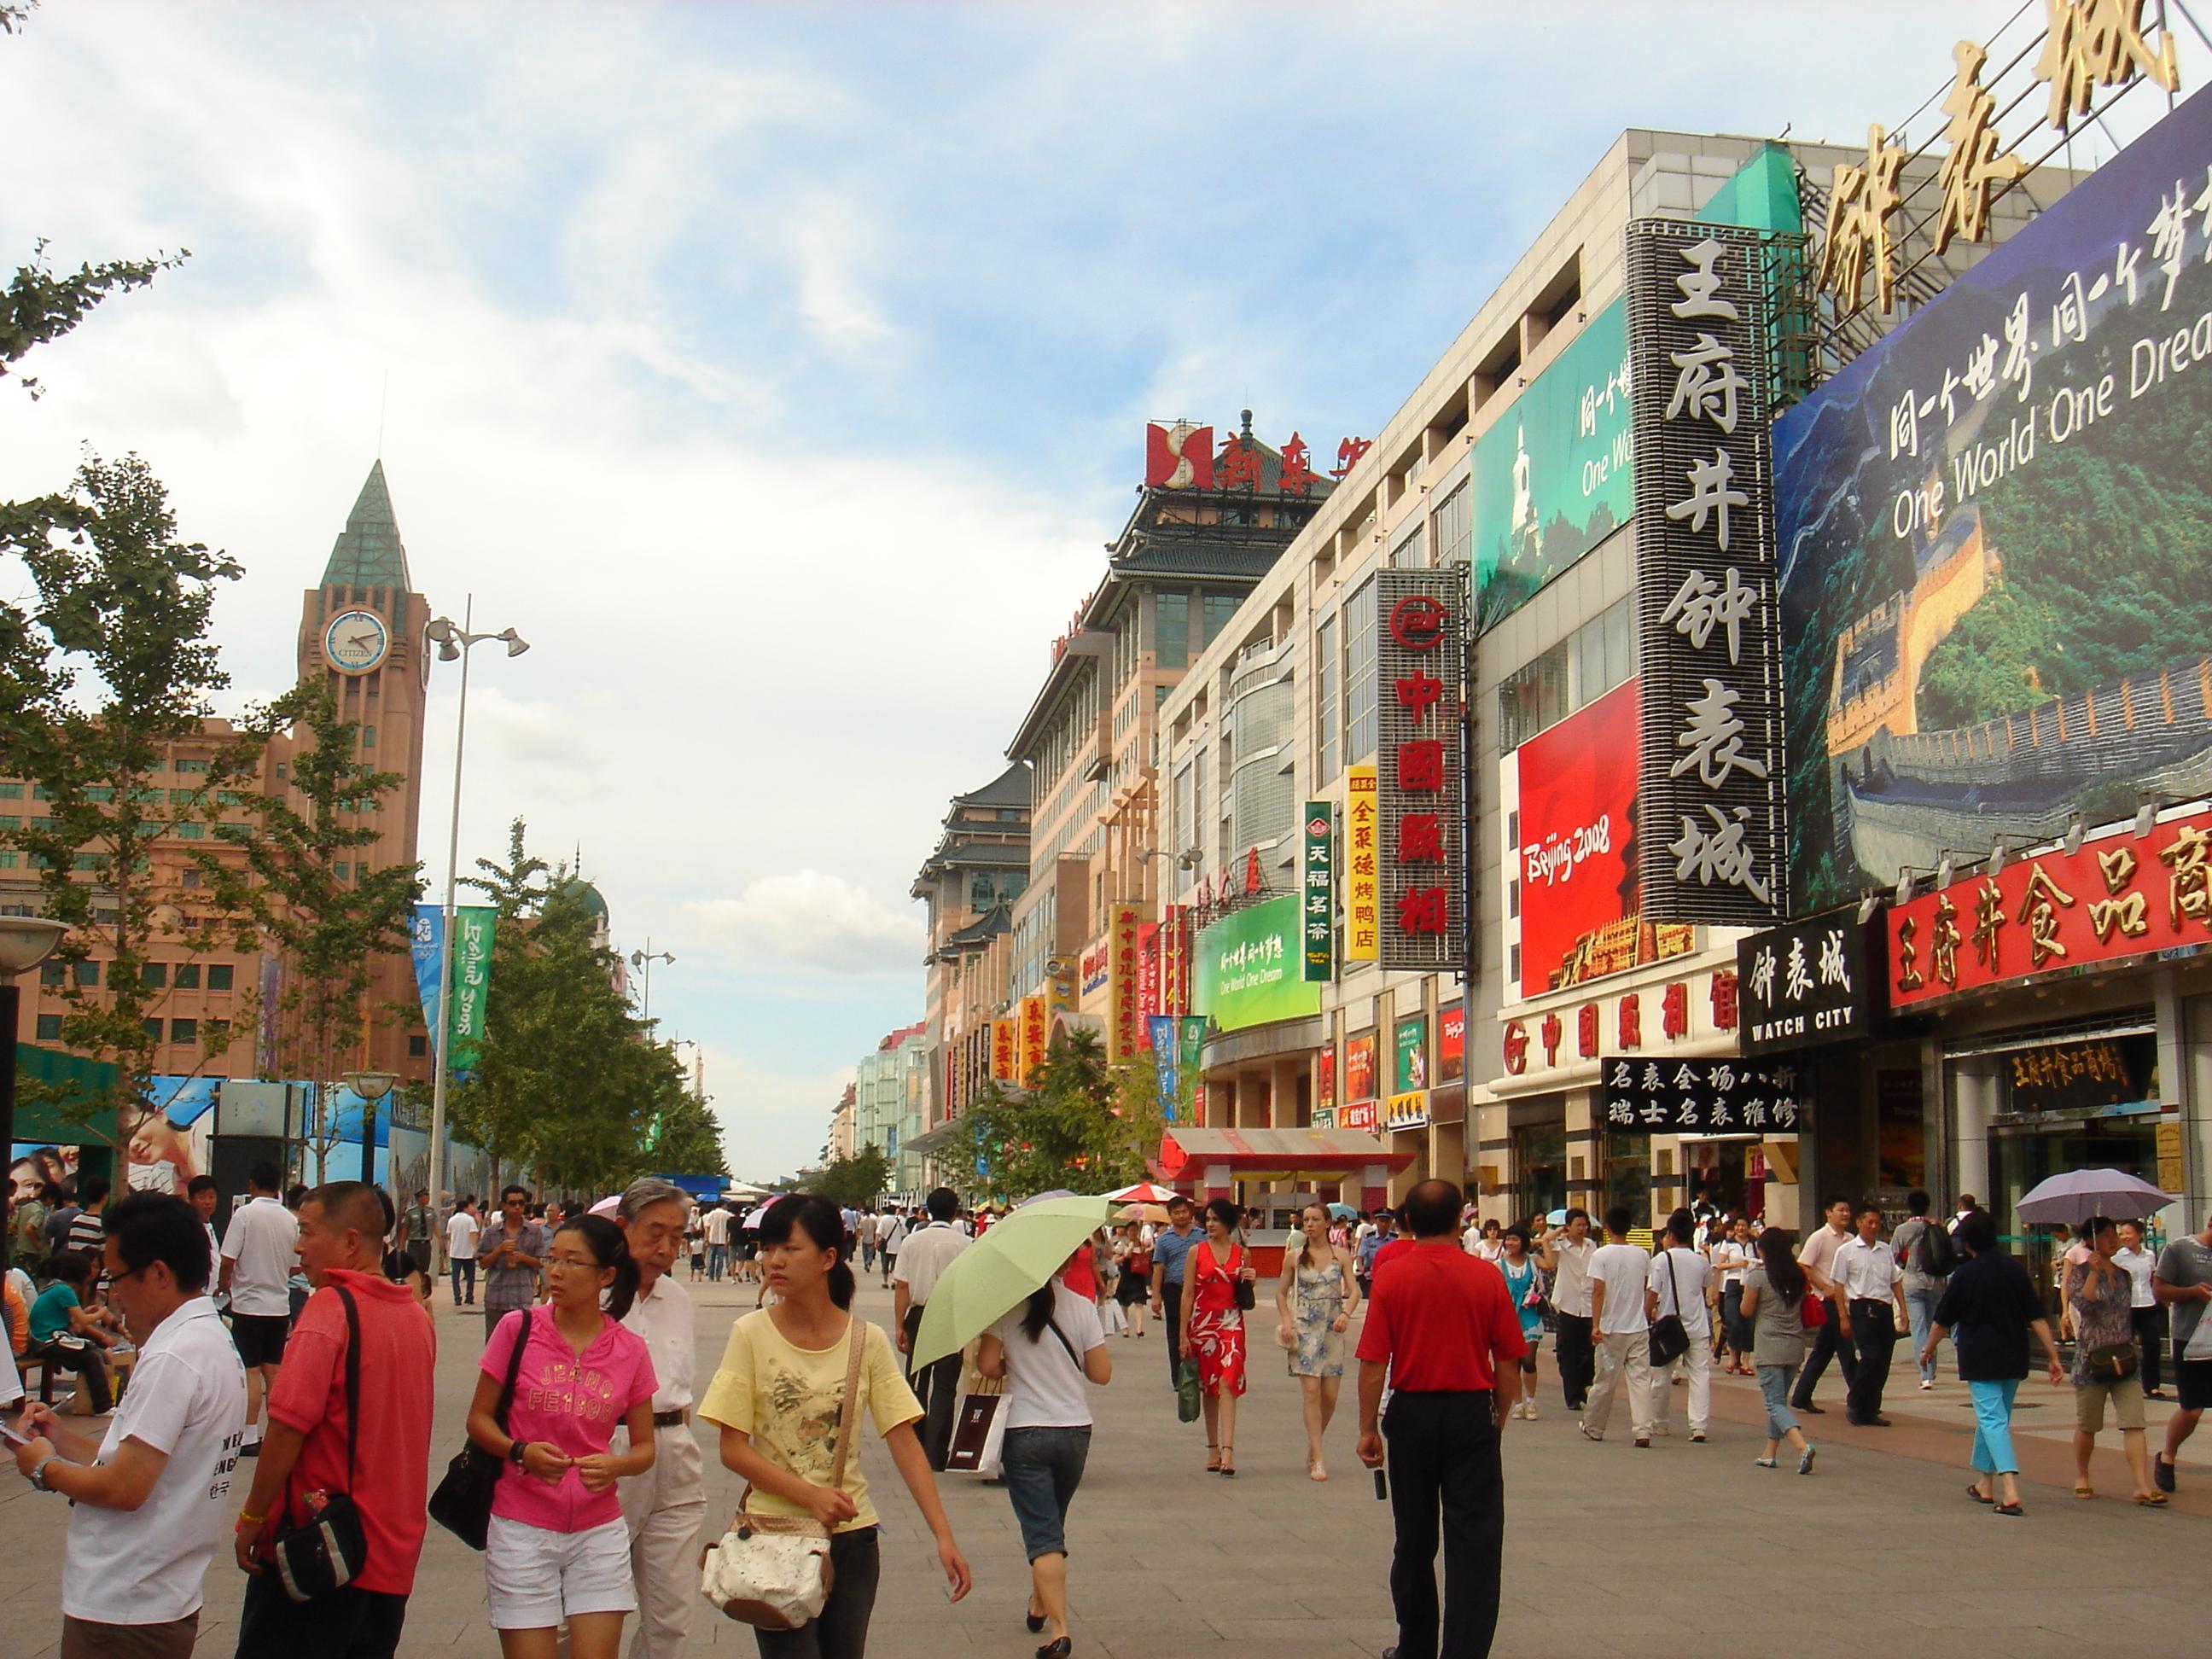 File:Wangfujing street, Beijing.JPG - Wikimedia Commons